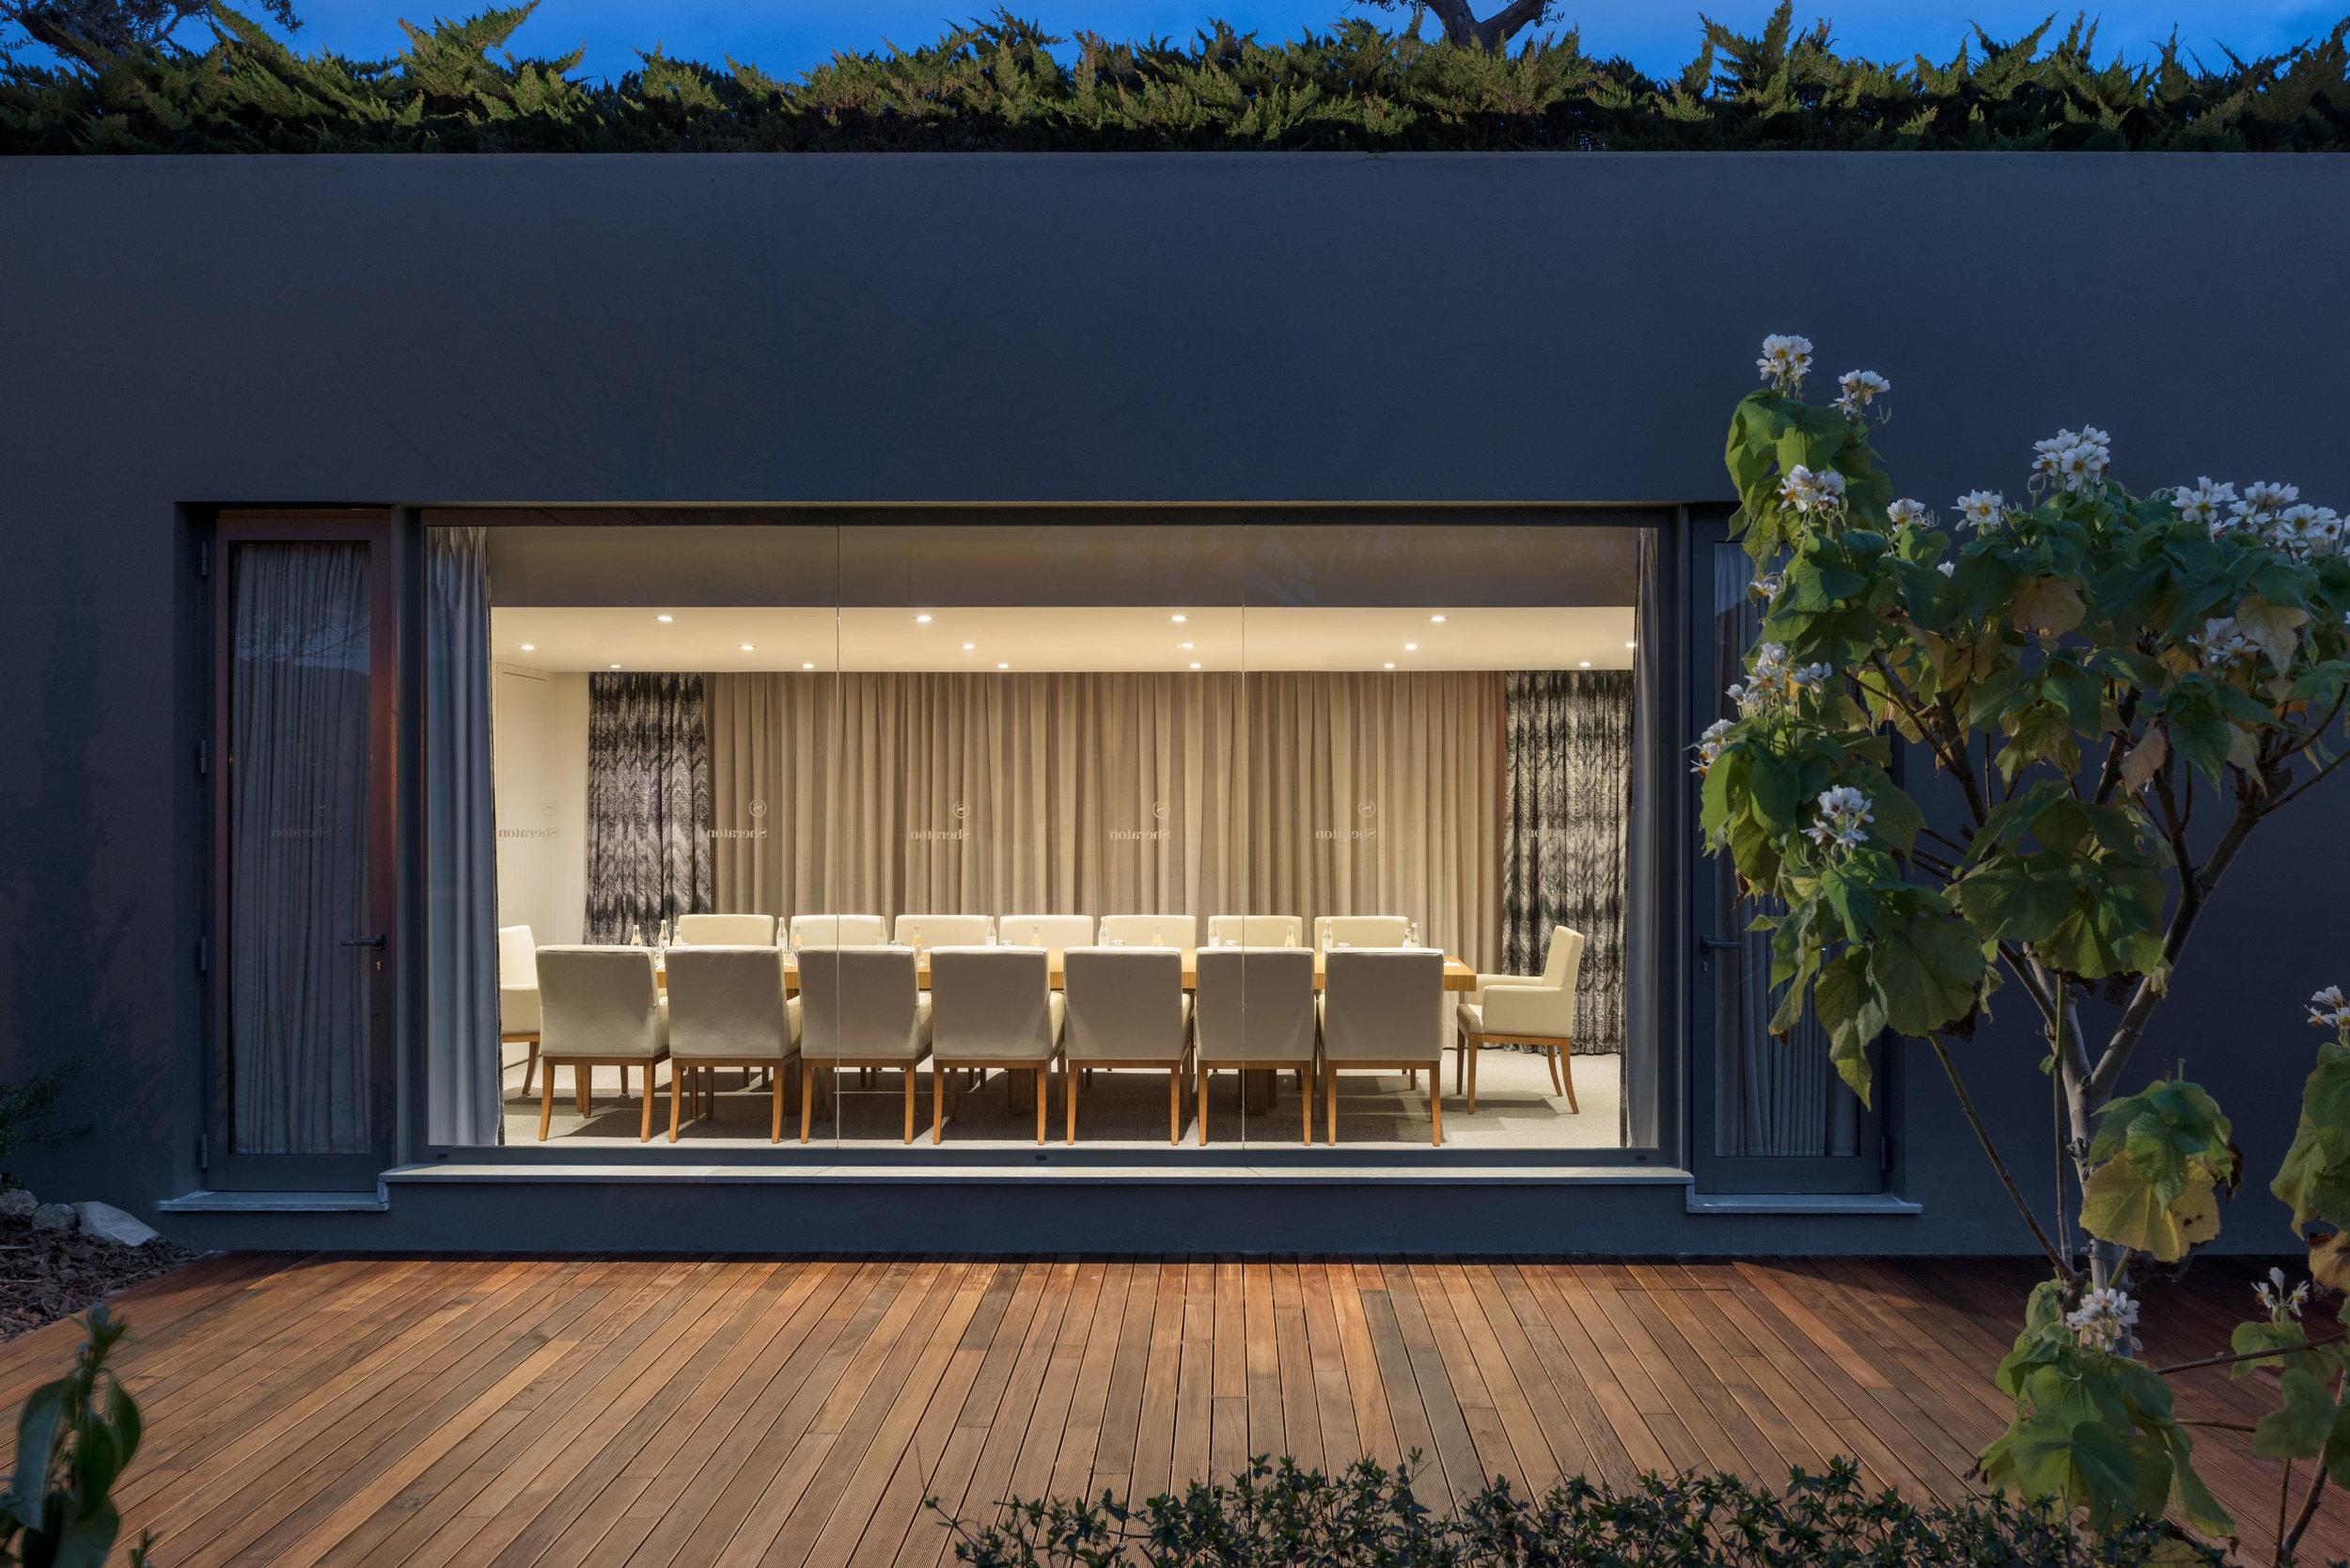 Architecture photography by ieva studio